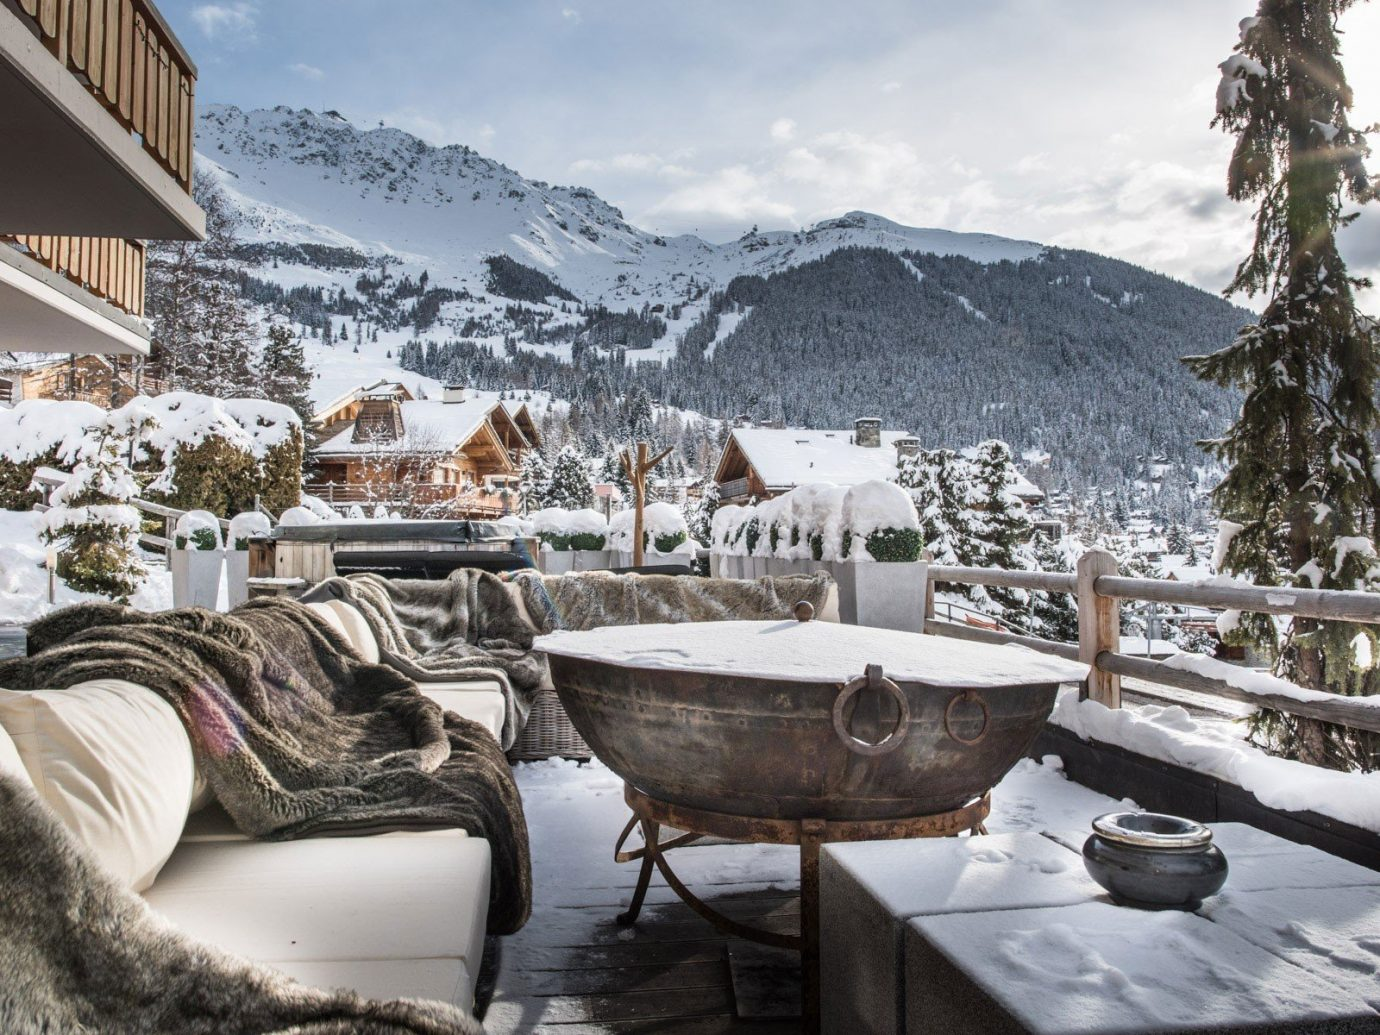 Hotels Luxury Travel Mountains + Skiing Trip Ideas sky outdoor snow Winter weather Resort season estate